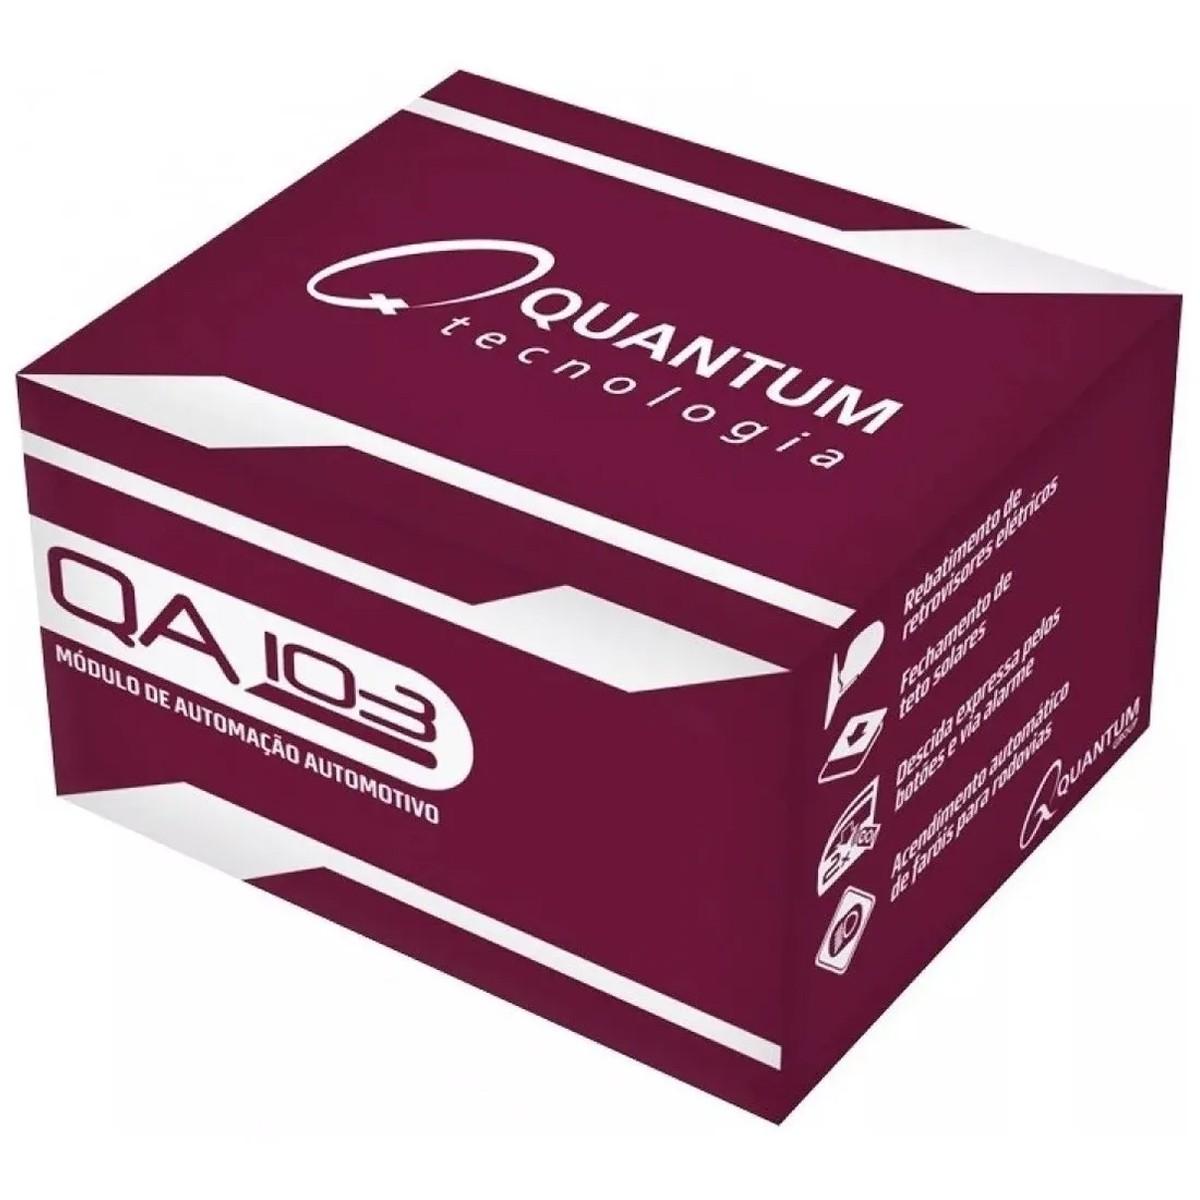 Módulo Automotivo Rebatimento Fechamento Retrovisores Teto Descida de Vidro Farois Automaticos Quantum Qa103